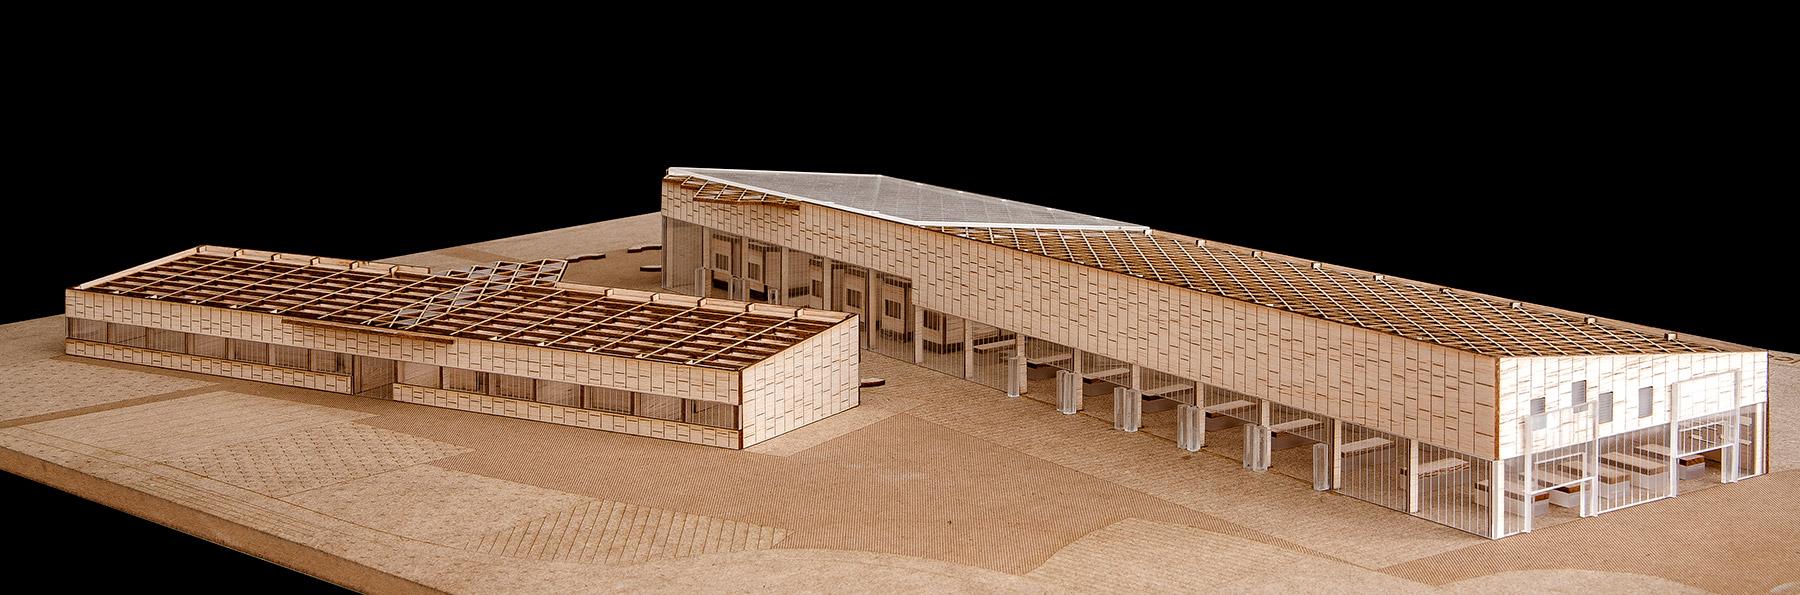 maqueta-arquitectura-architecture-model-valencia-maqueta-pfc-ETSAV-centro-artesanos- (7)